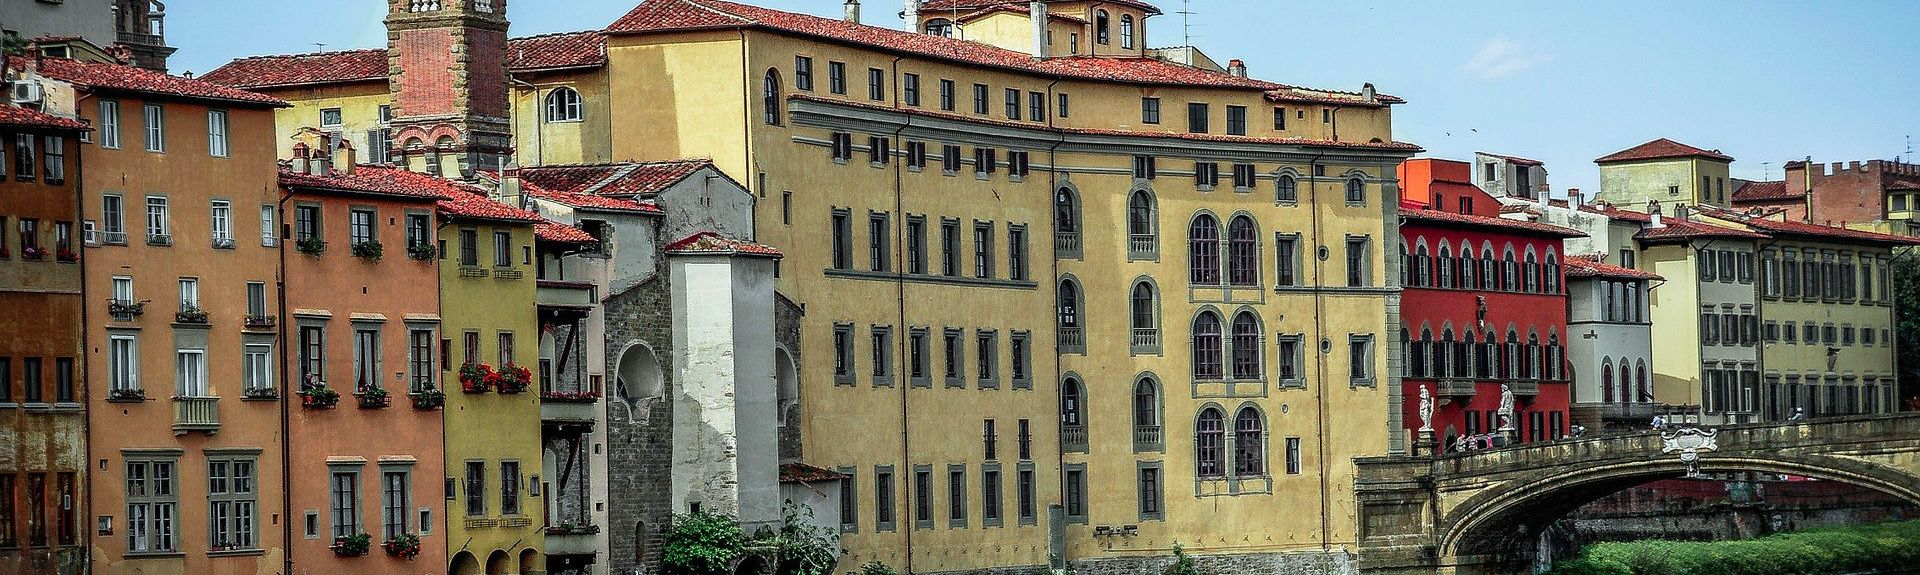 San Niccolò, Firenze, Toscana, Italien